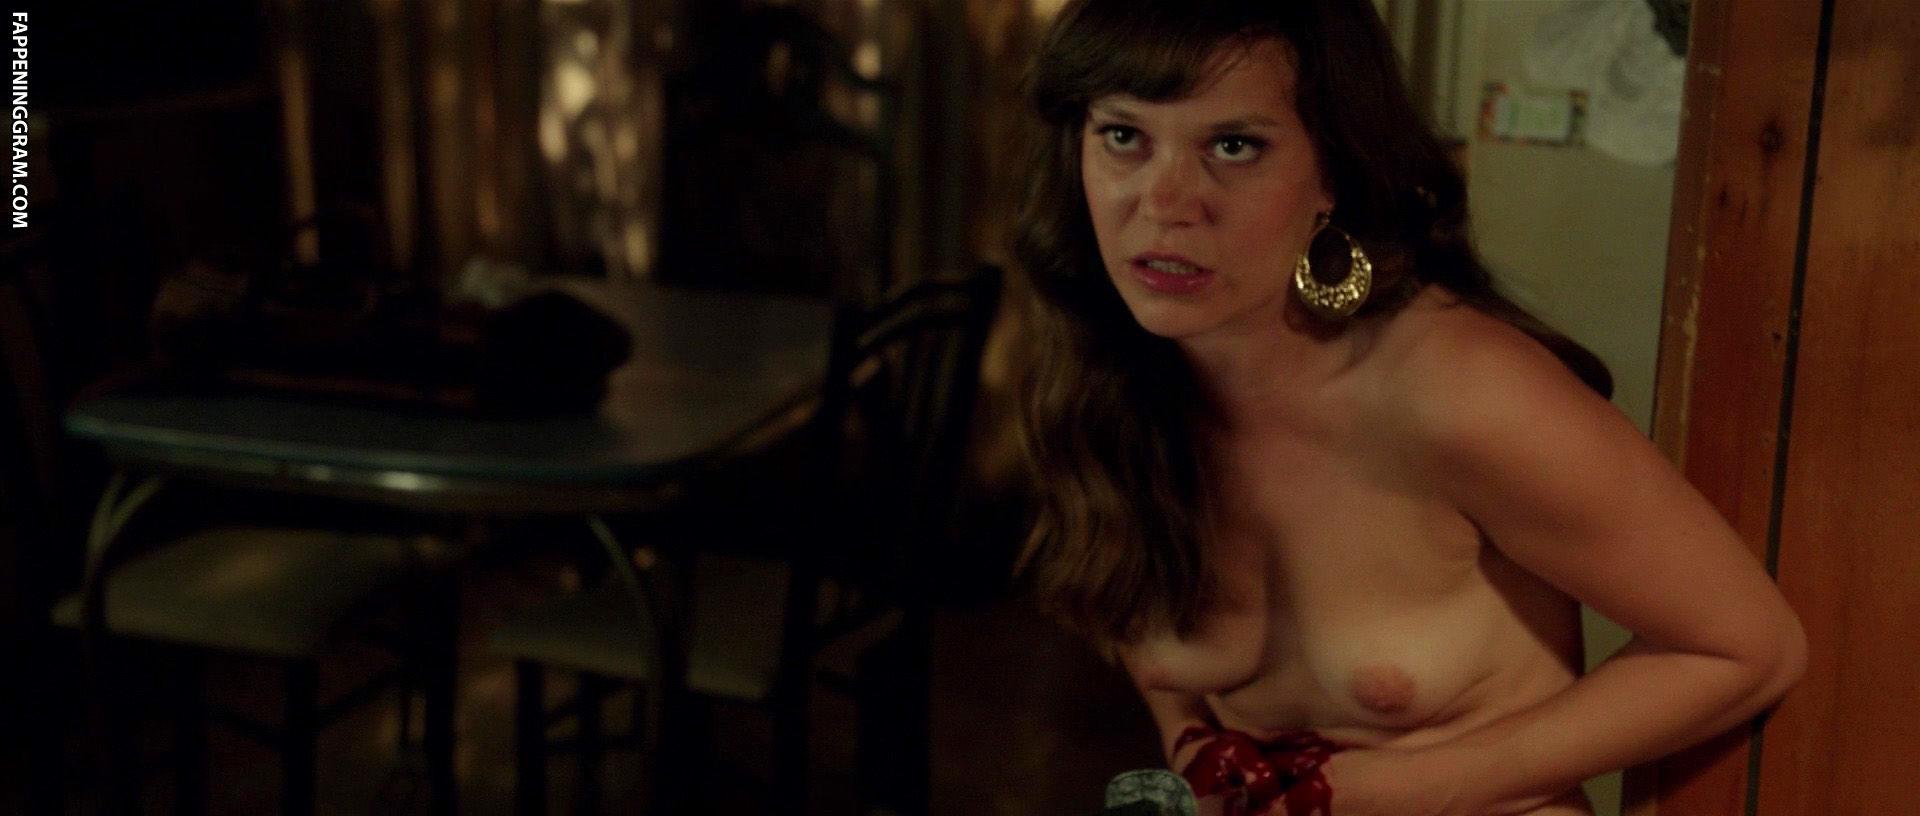 Nude Catherine Keener Fakes